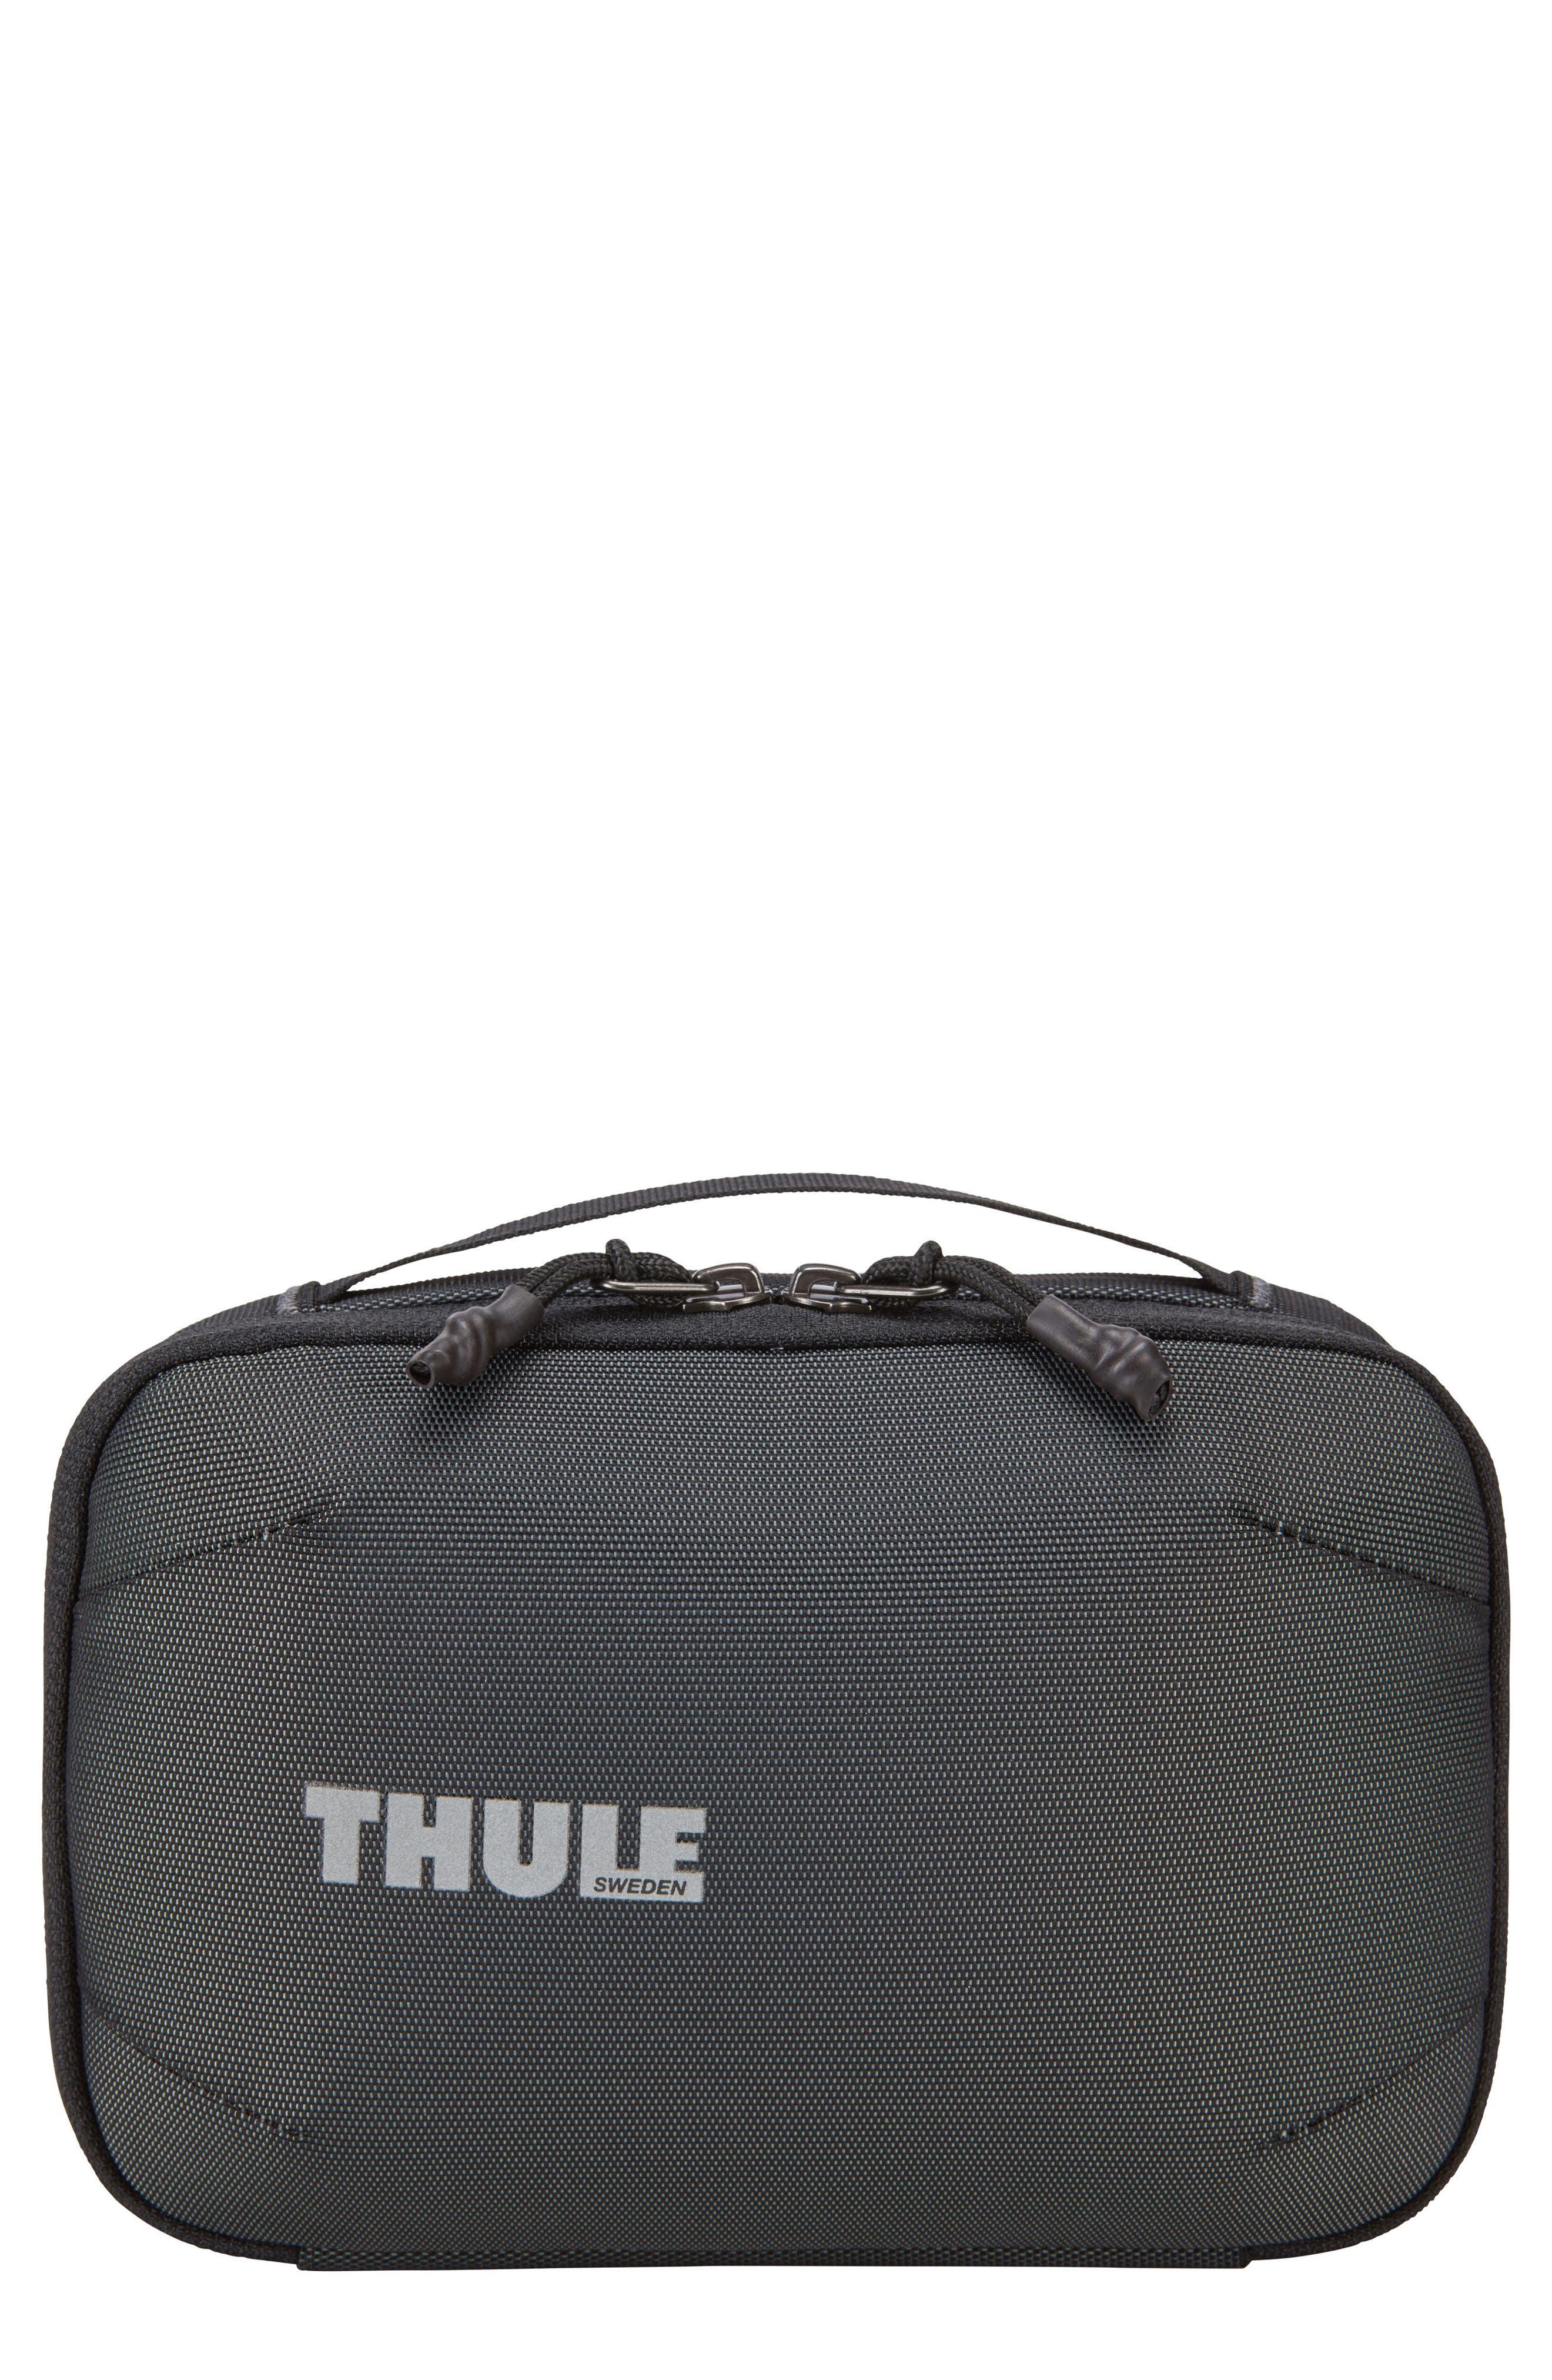 Alternate Image 1 Selected - Thule Subterra Powershuttle Travel Case